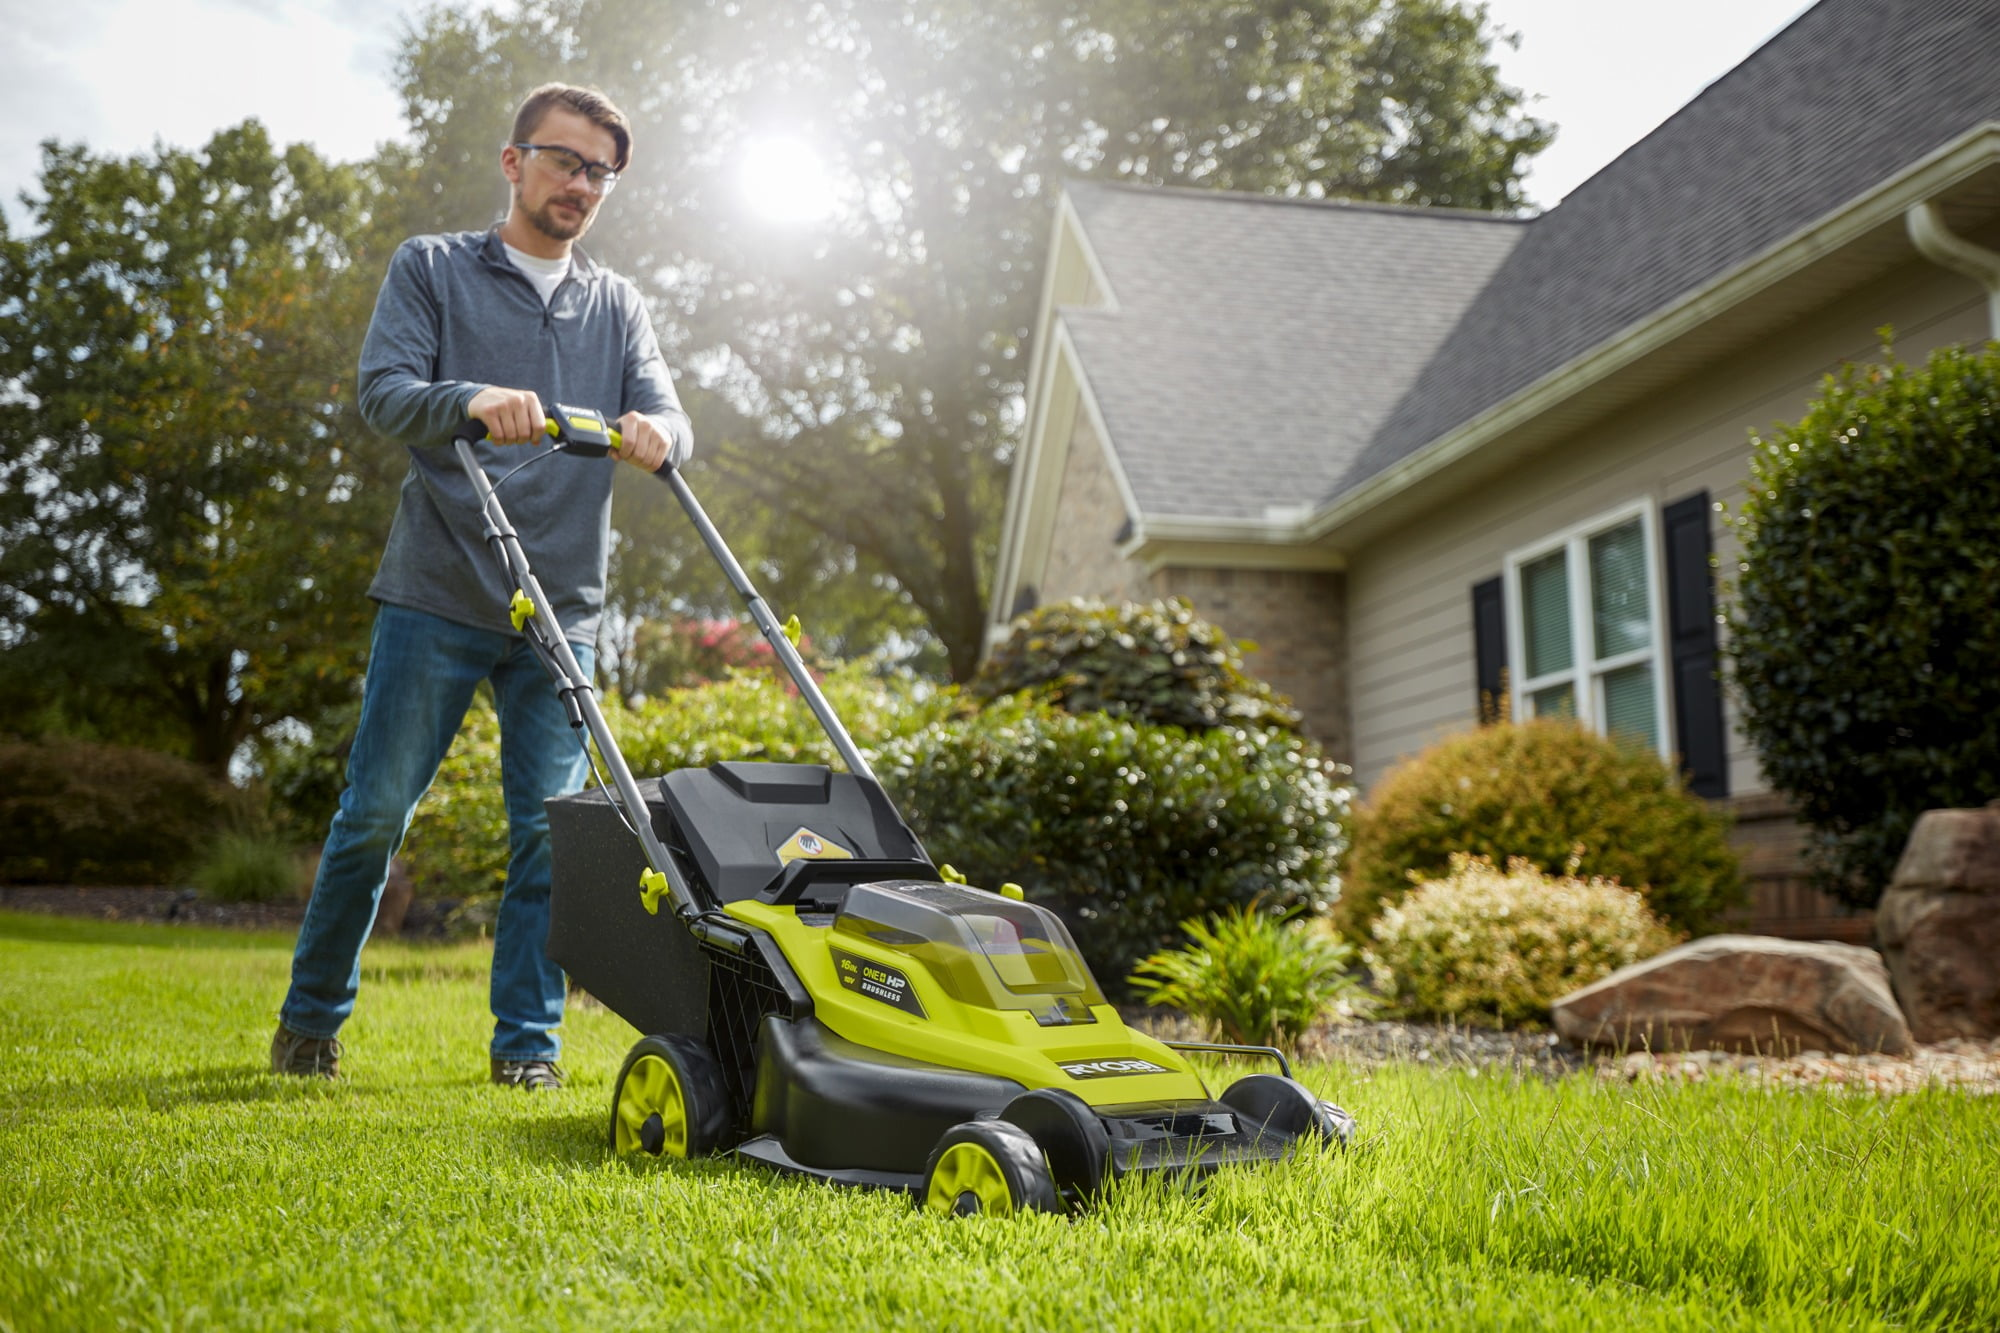 Lawn mower, Plant, Wheel, Tire, Sky, Grass, Tree, Yellow